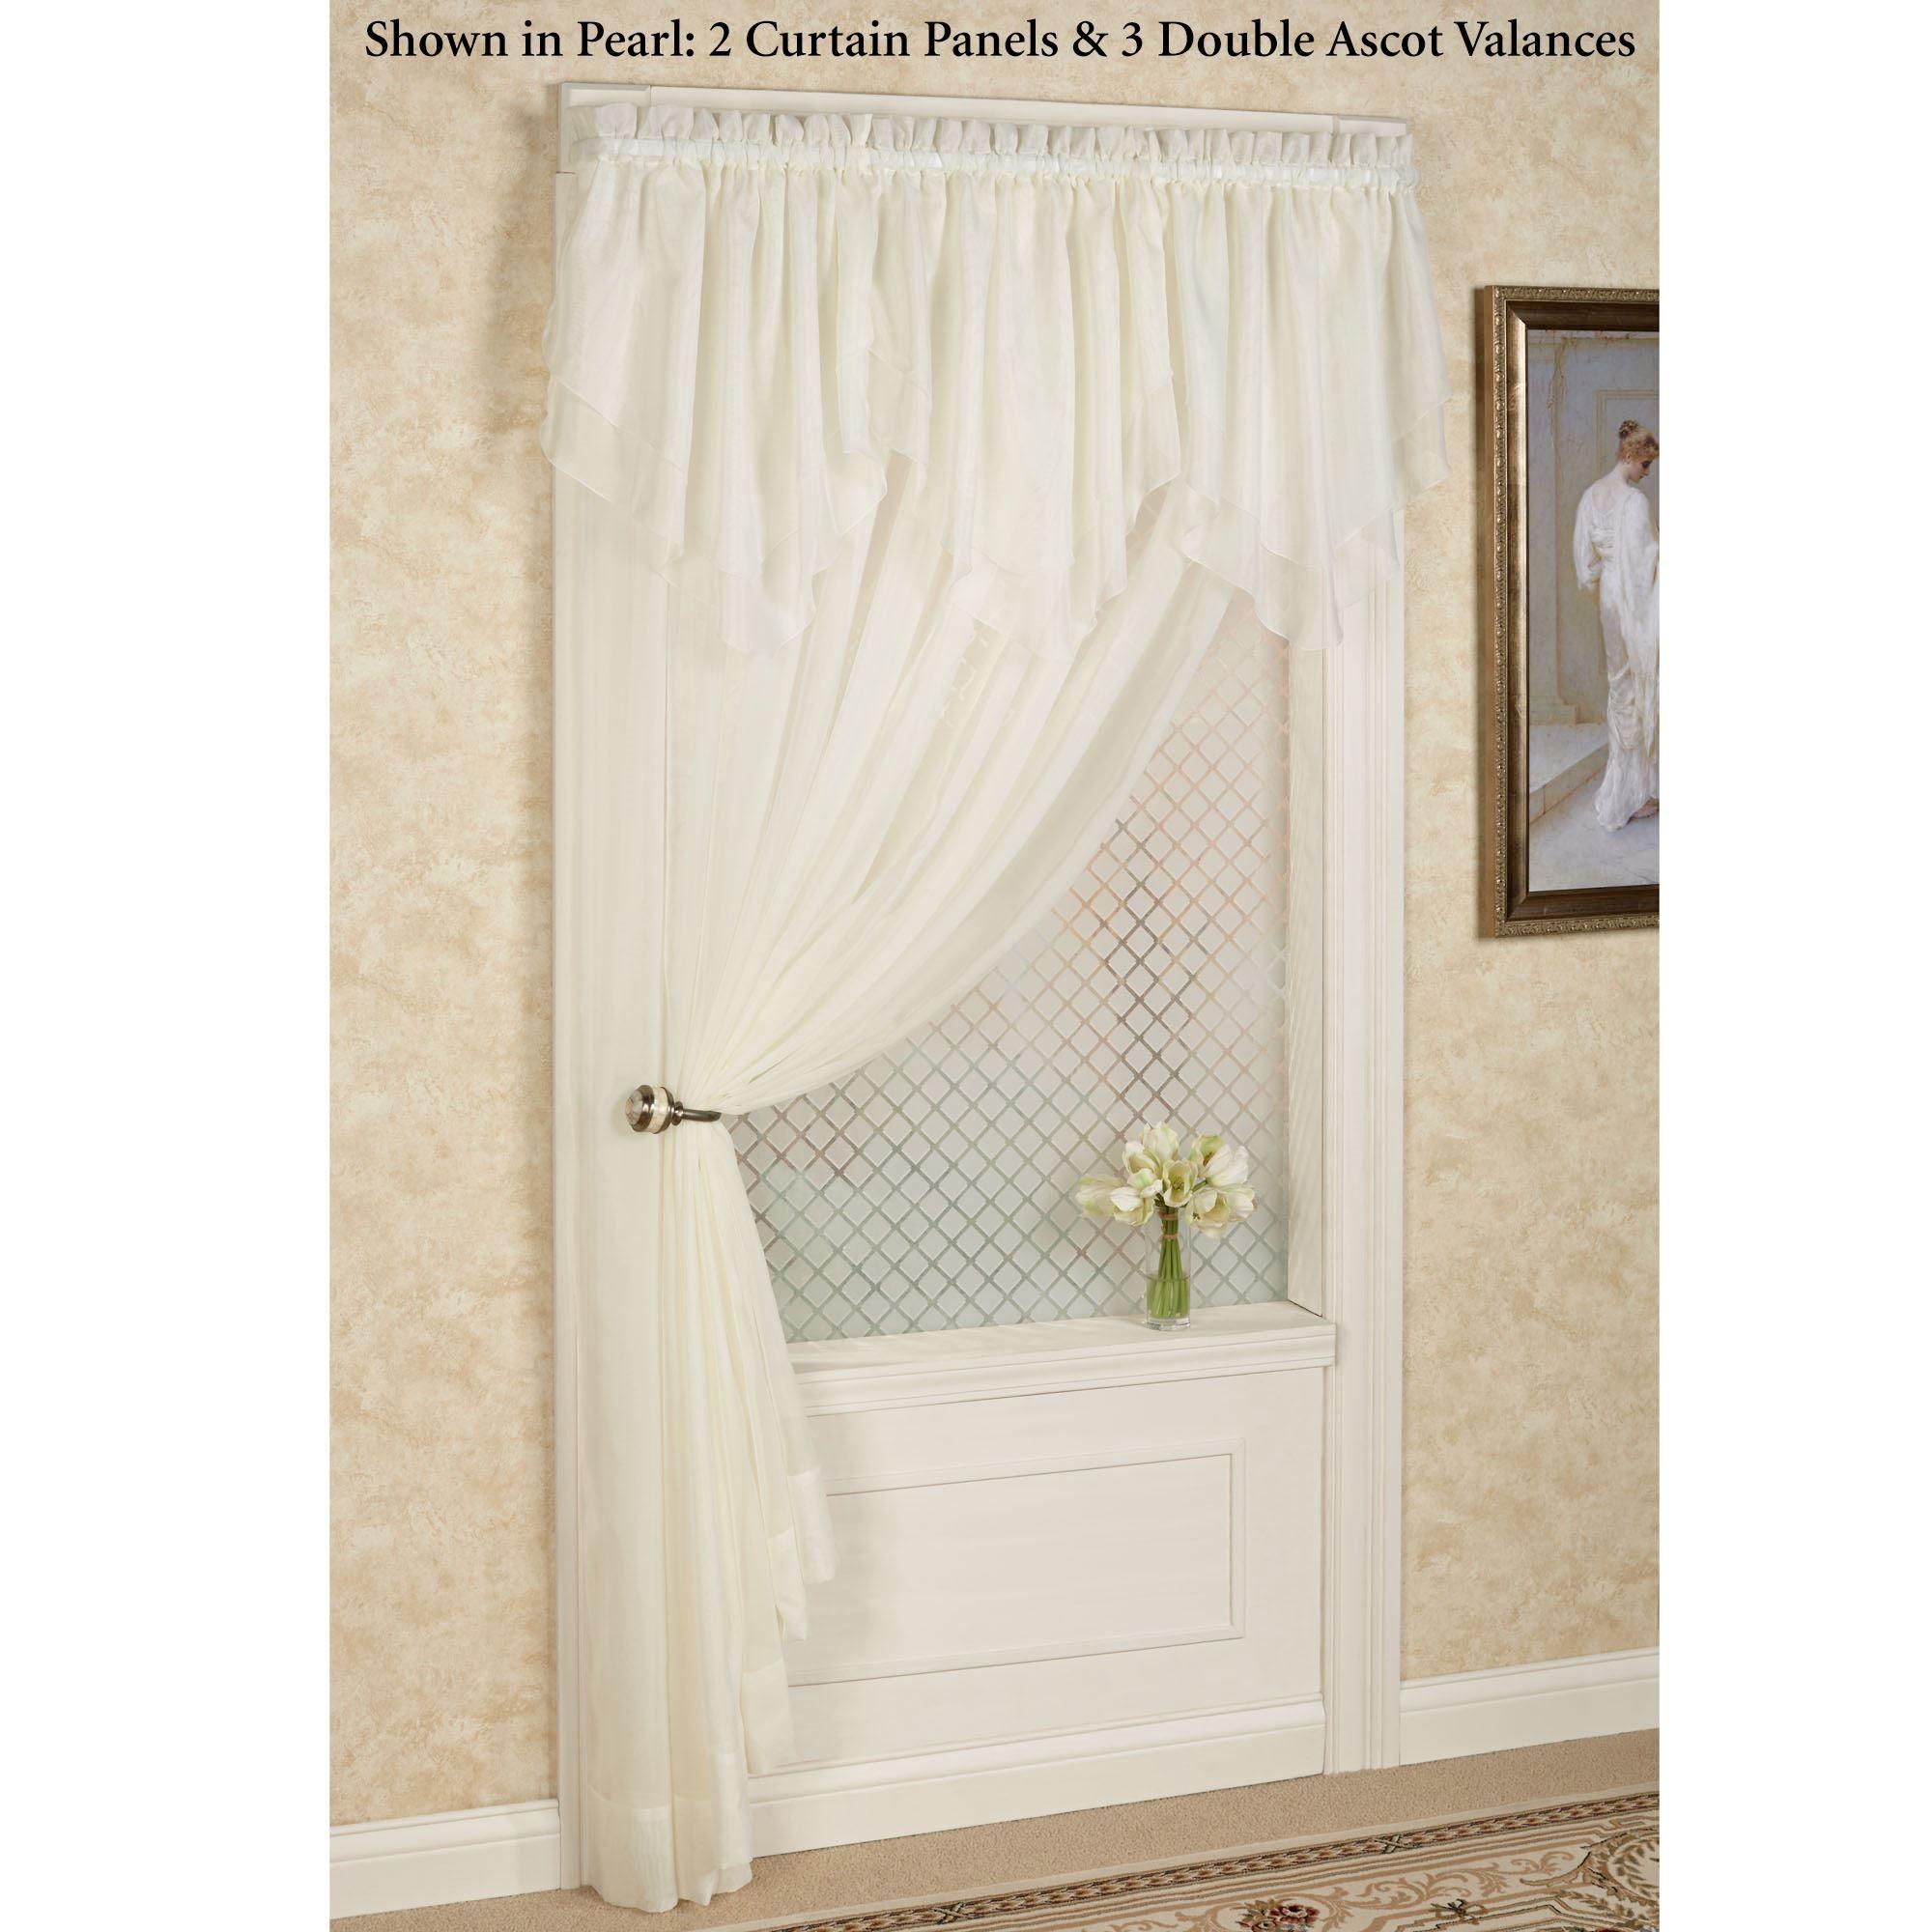 Emelia Sheer Voile Double Ascot Valance Window Treatment